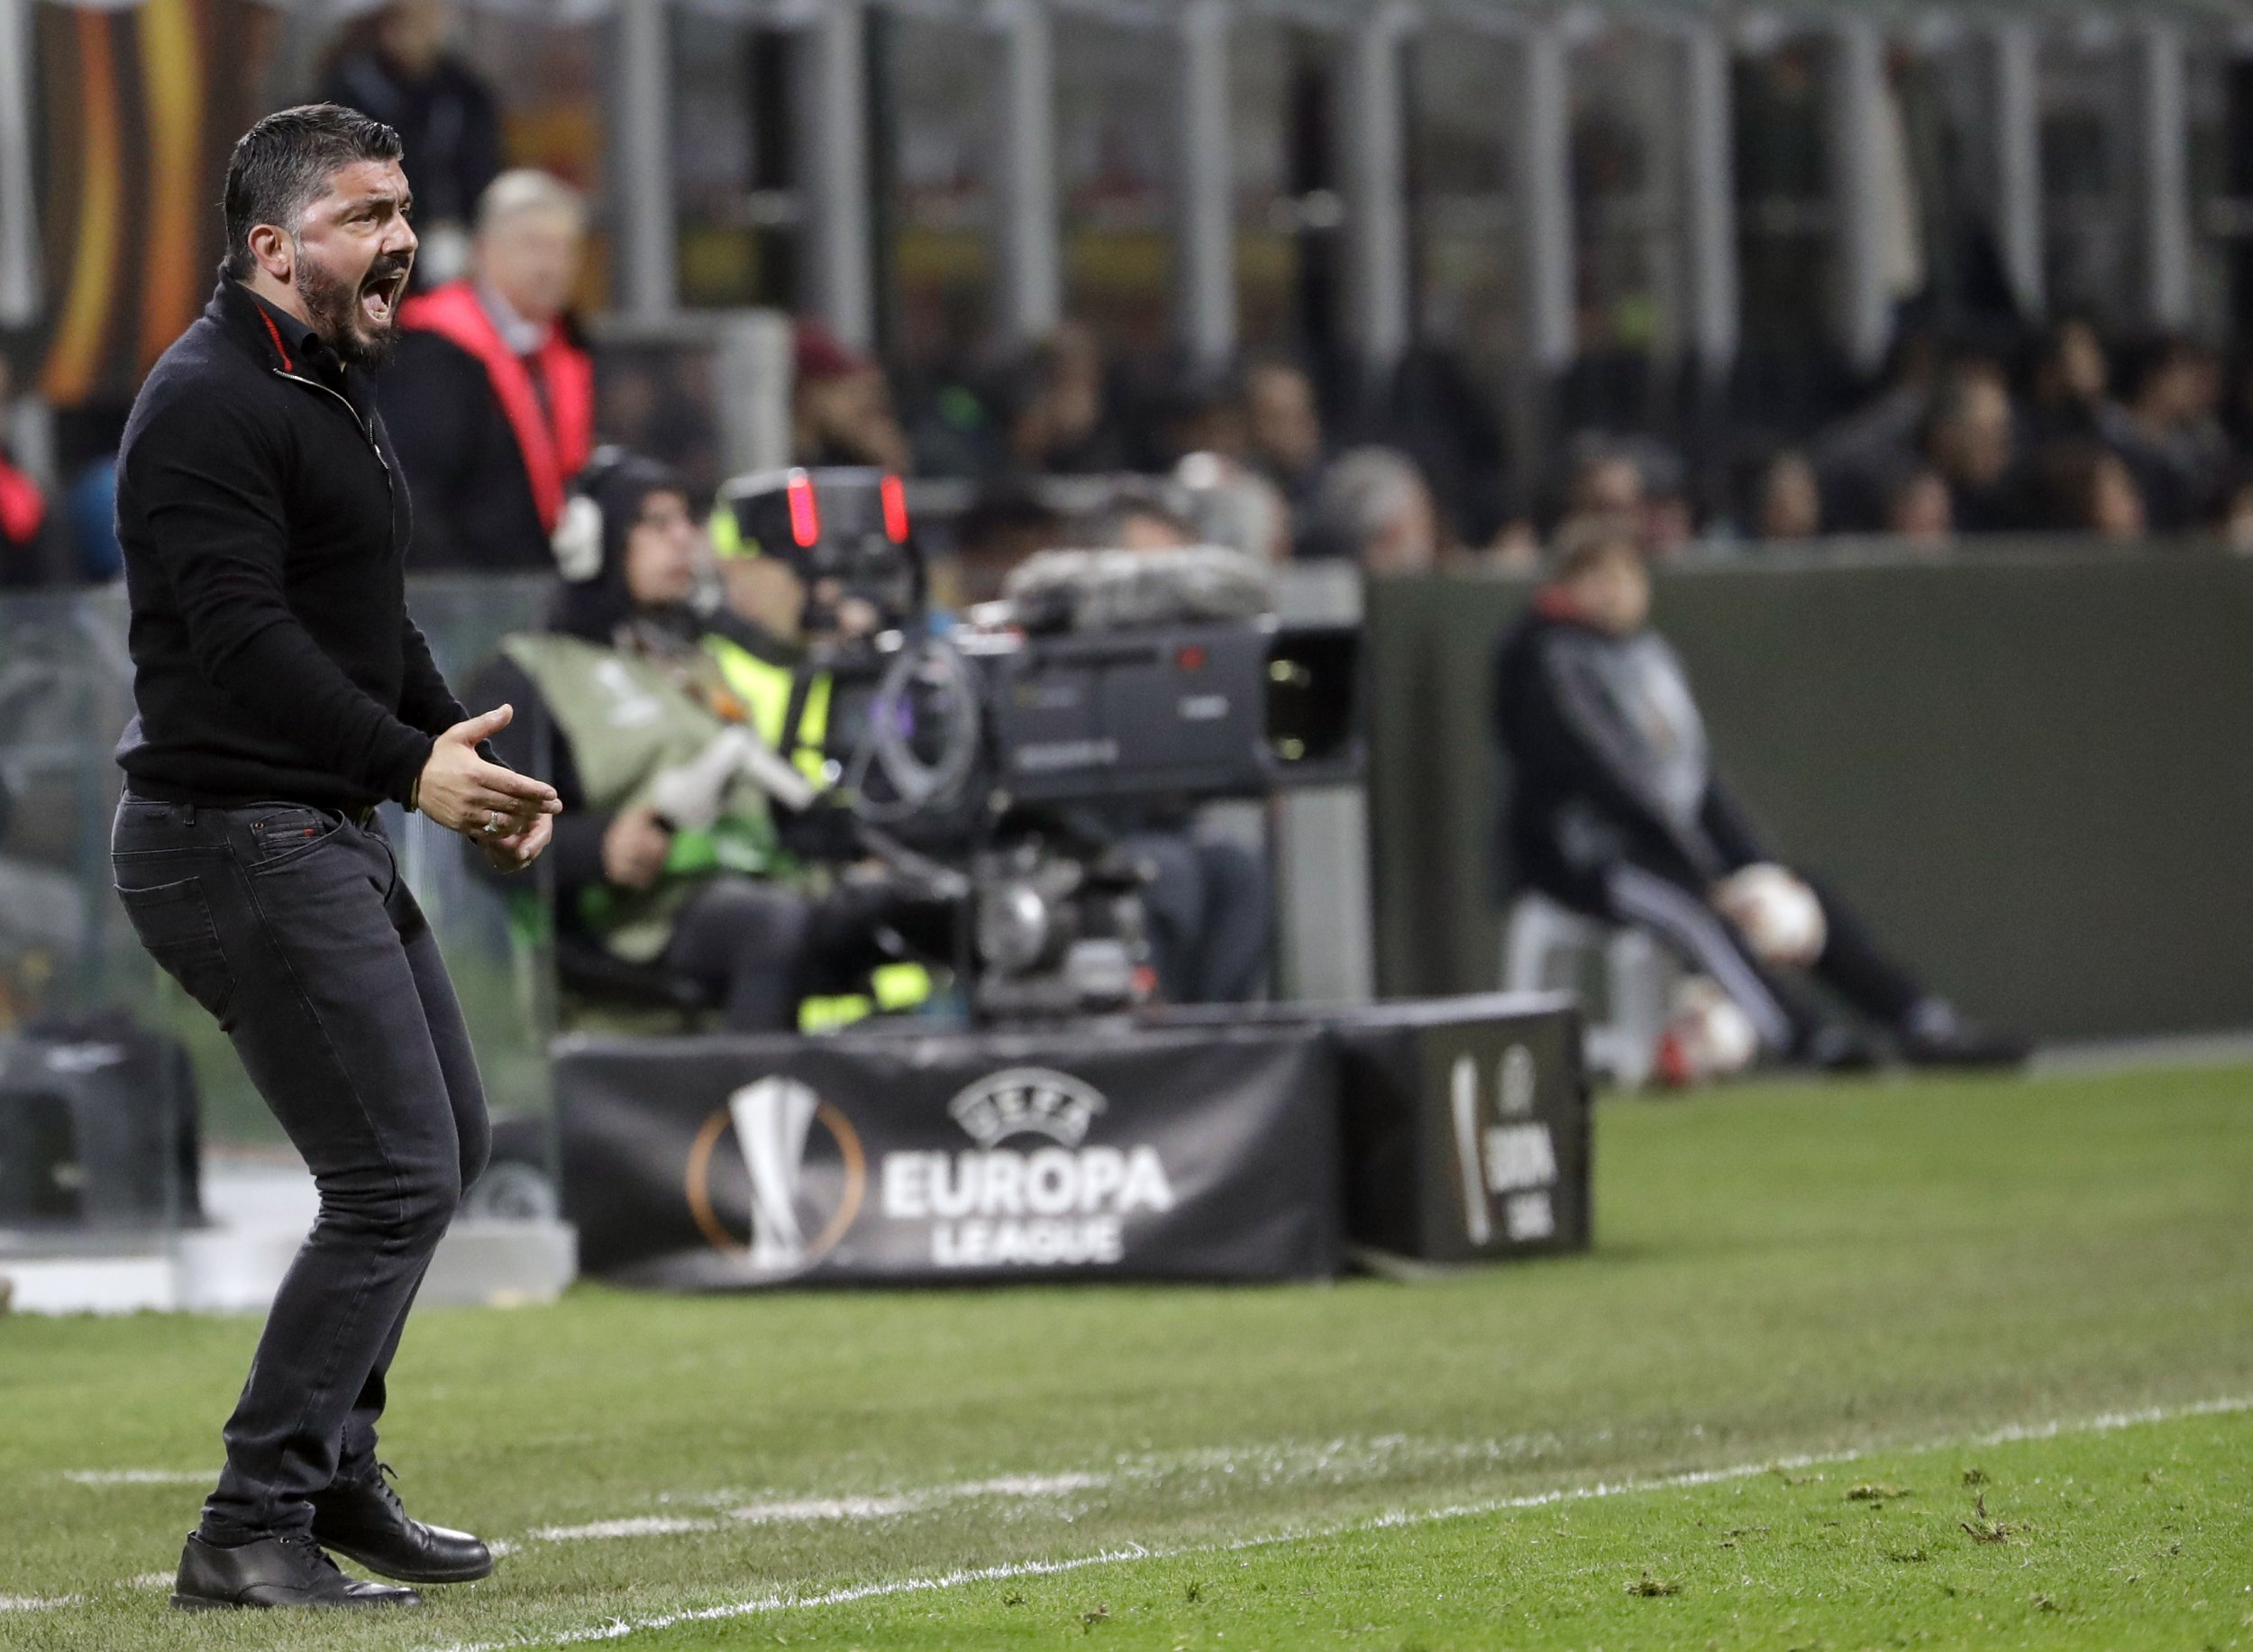 AC Milan have 30 per cent chance of progressing past Arsenal, says Gennaro Gattuso